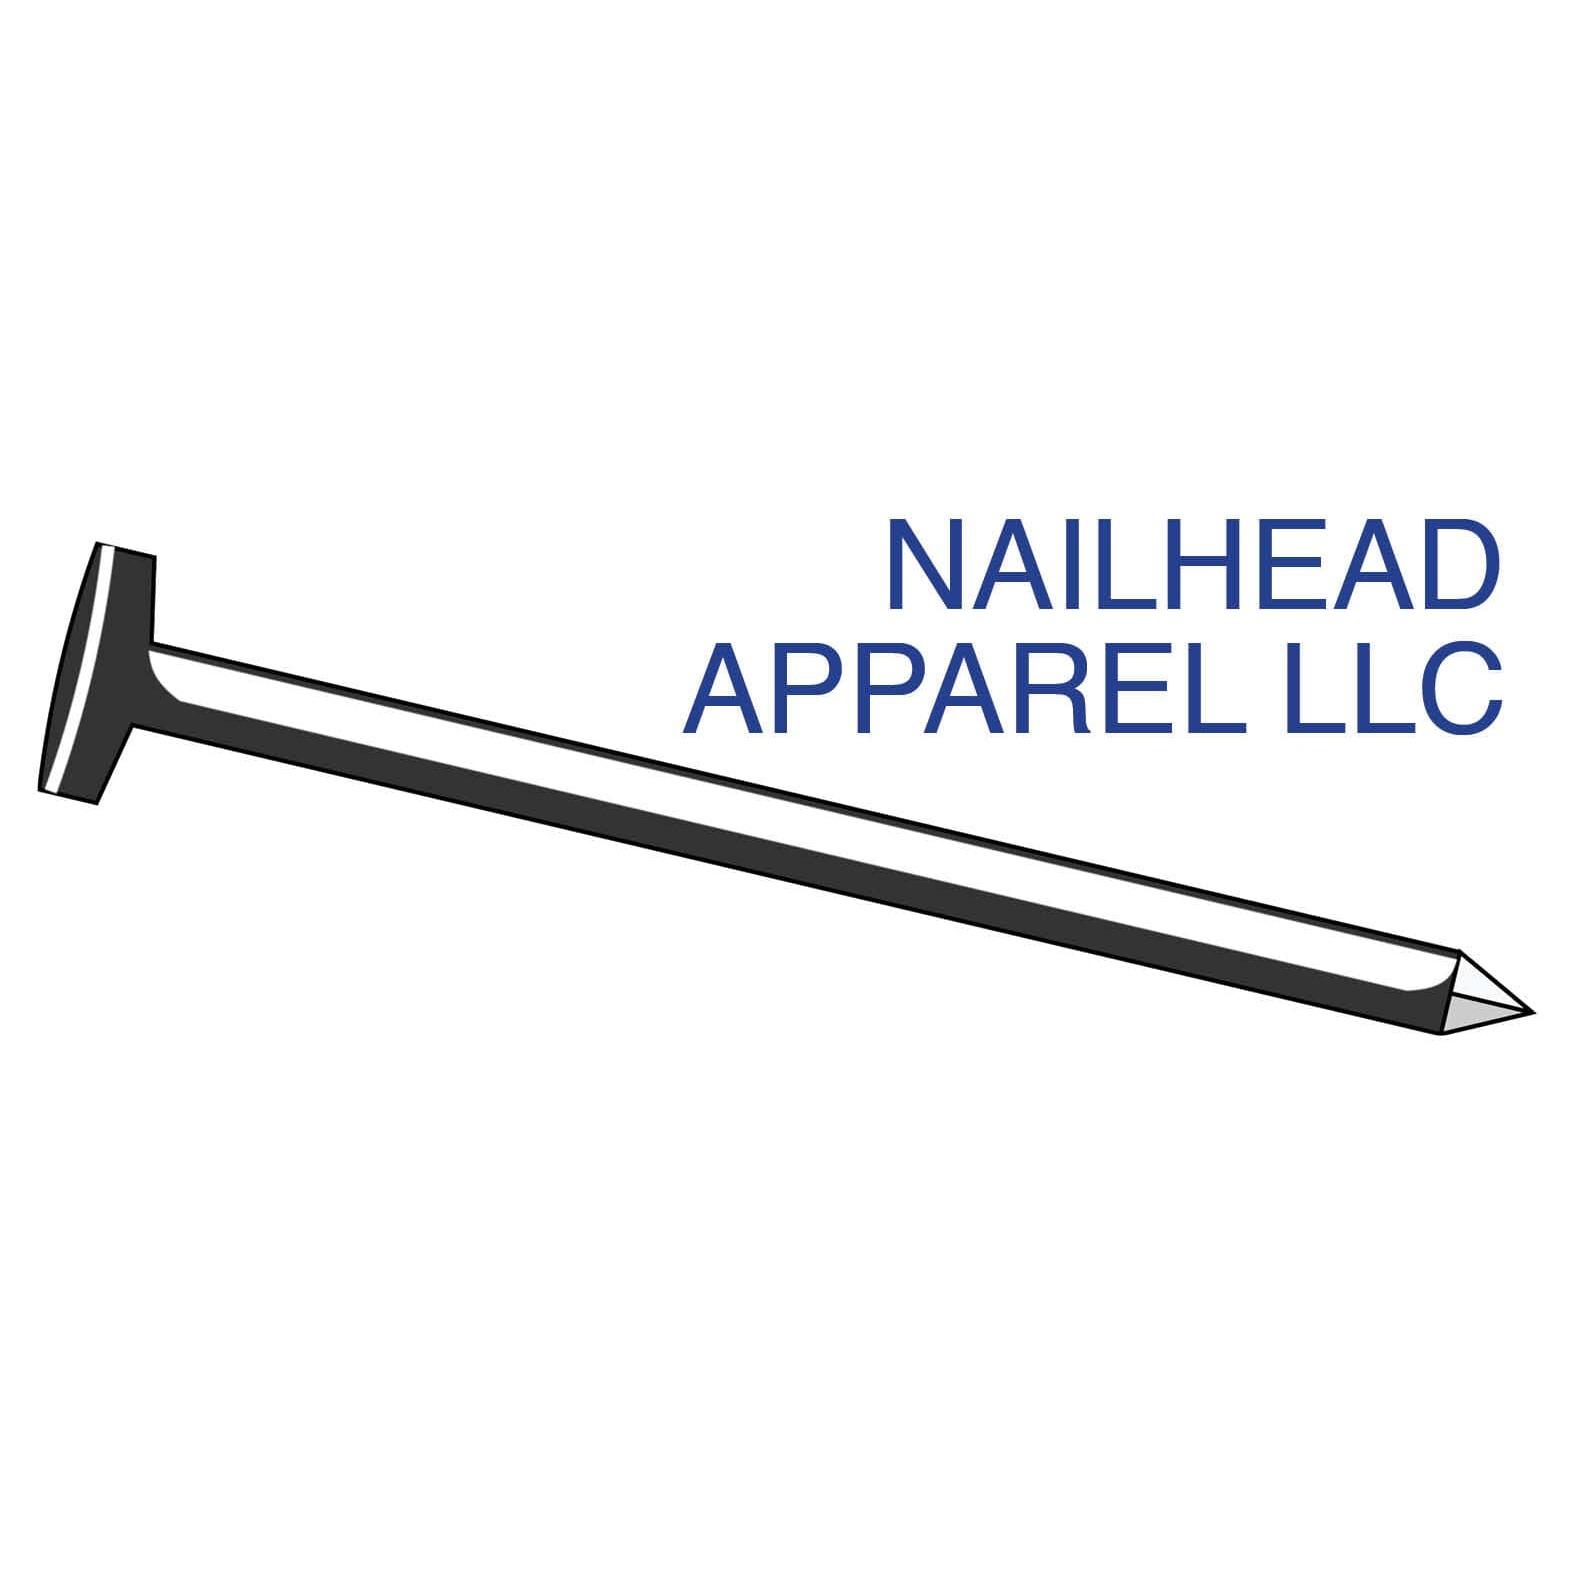 Nailhead Apparel LLC image 0